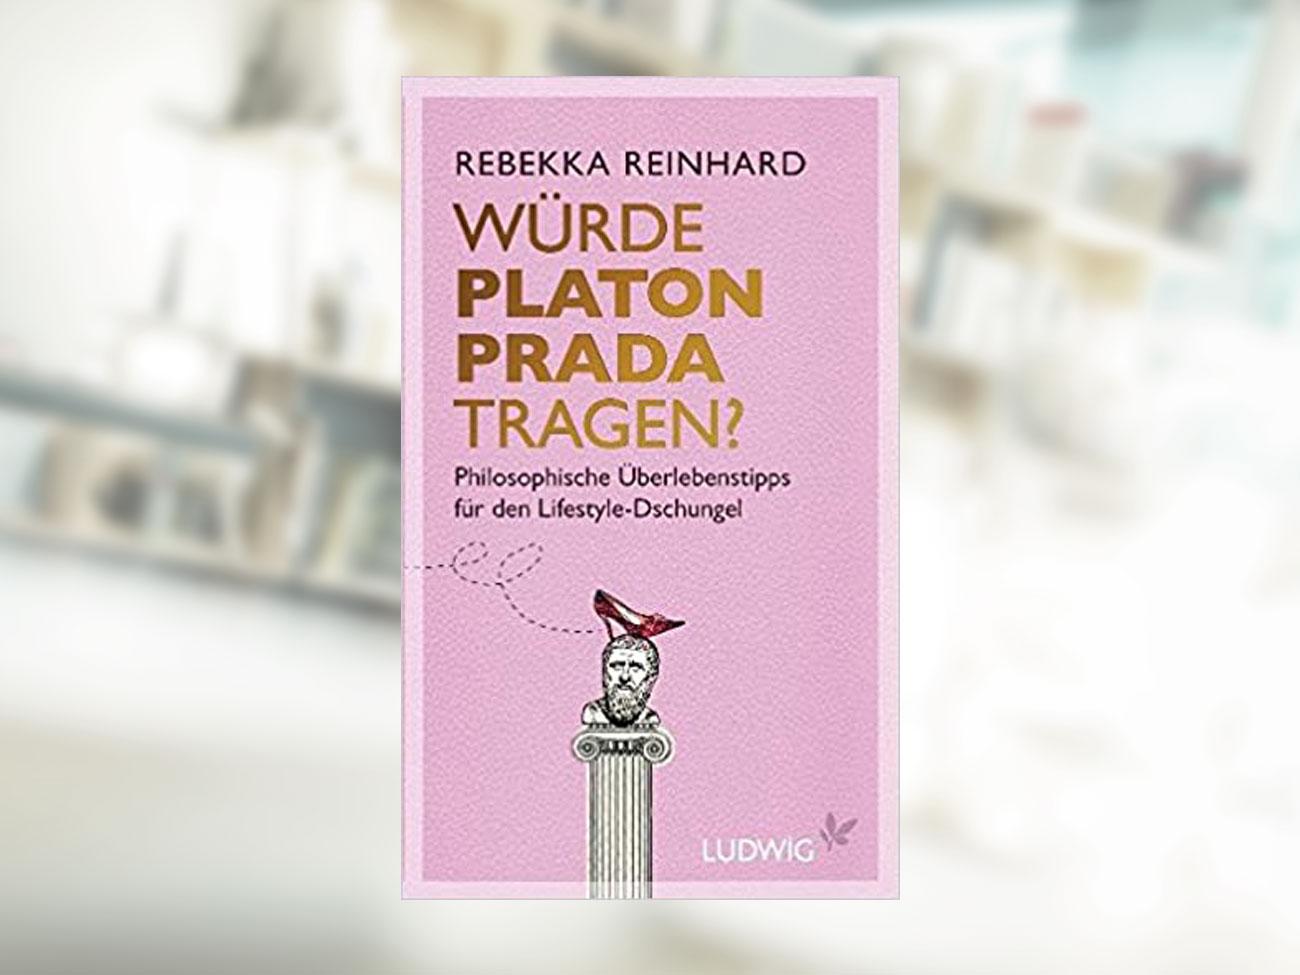 Rebekka Reinhard, Würde Platon Prada tragen